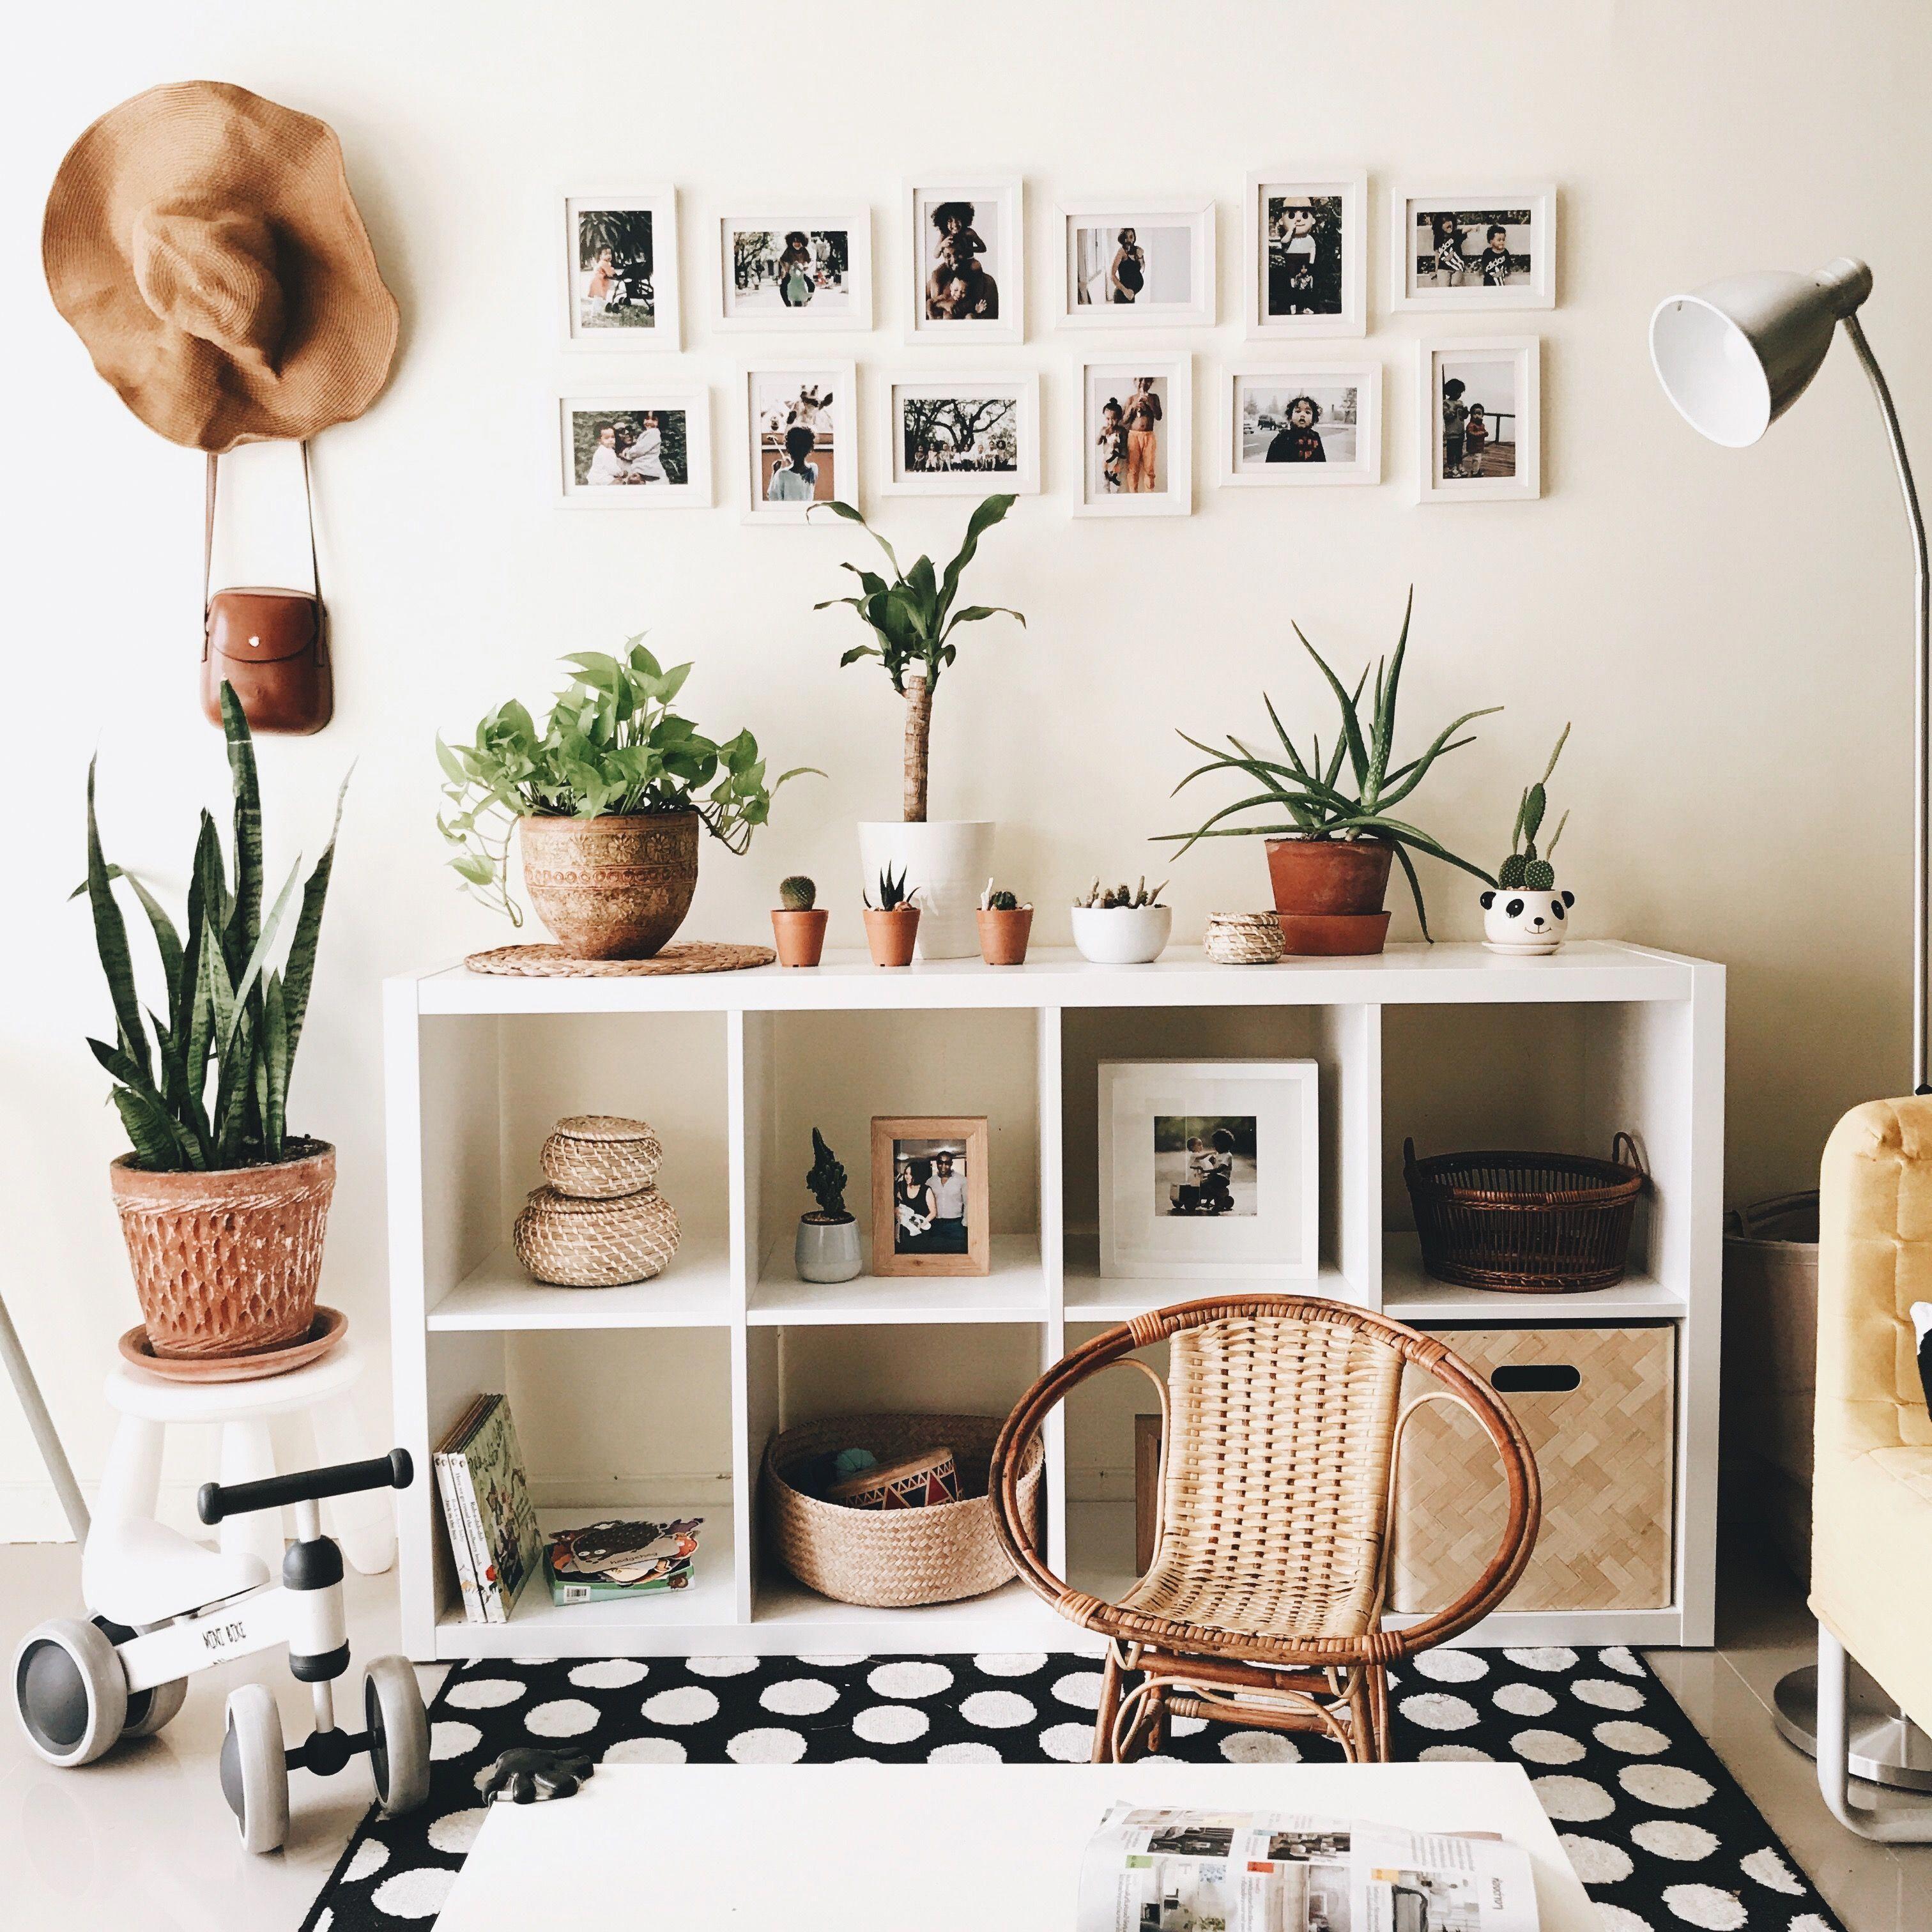 9 Awesome Living Room Design Ideas: 5 Awesome Unique Ideas: Feminine Minimalist Decor Lights